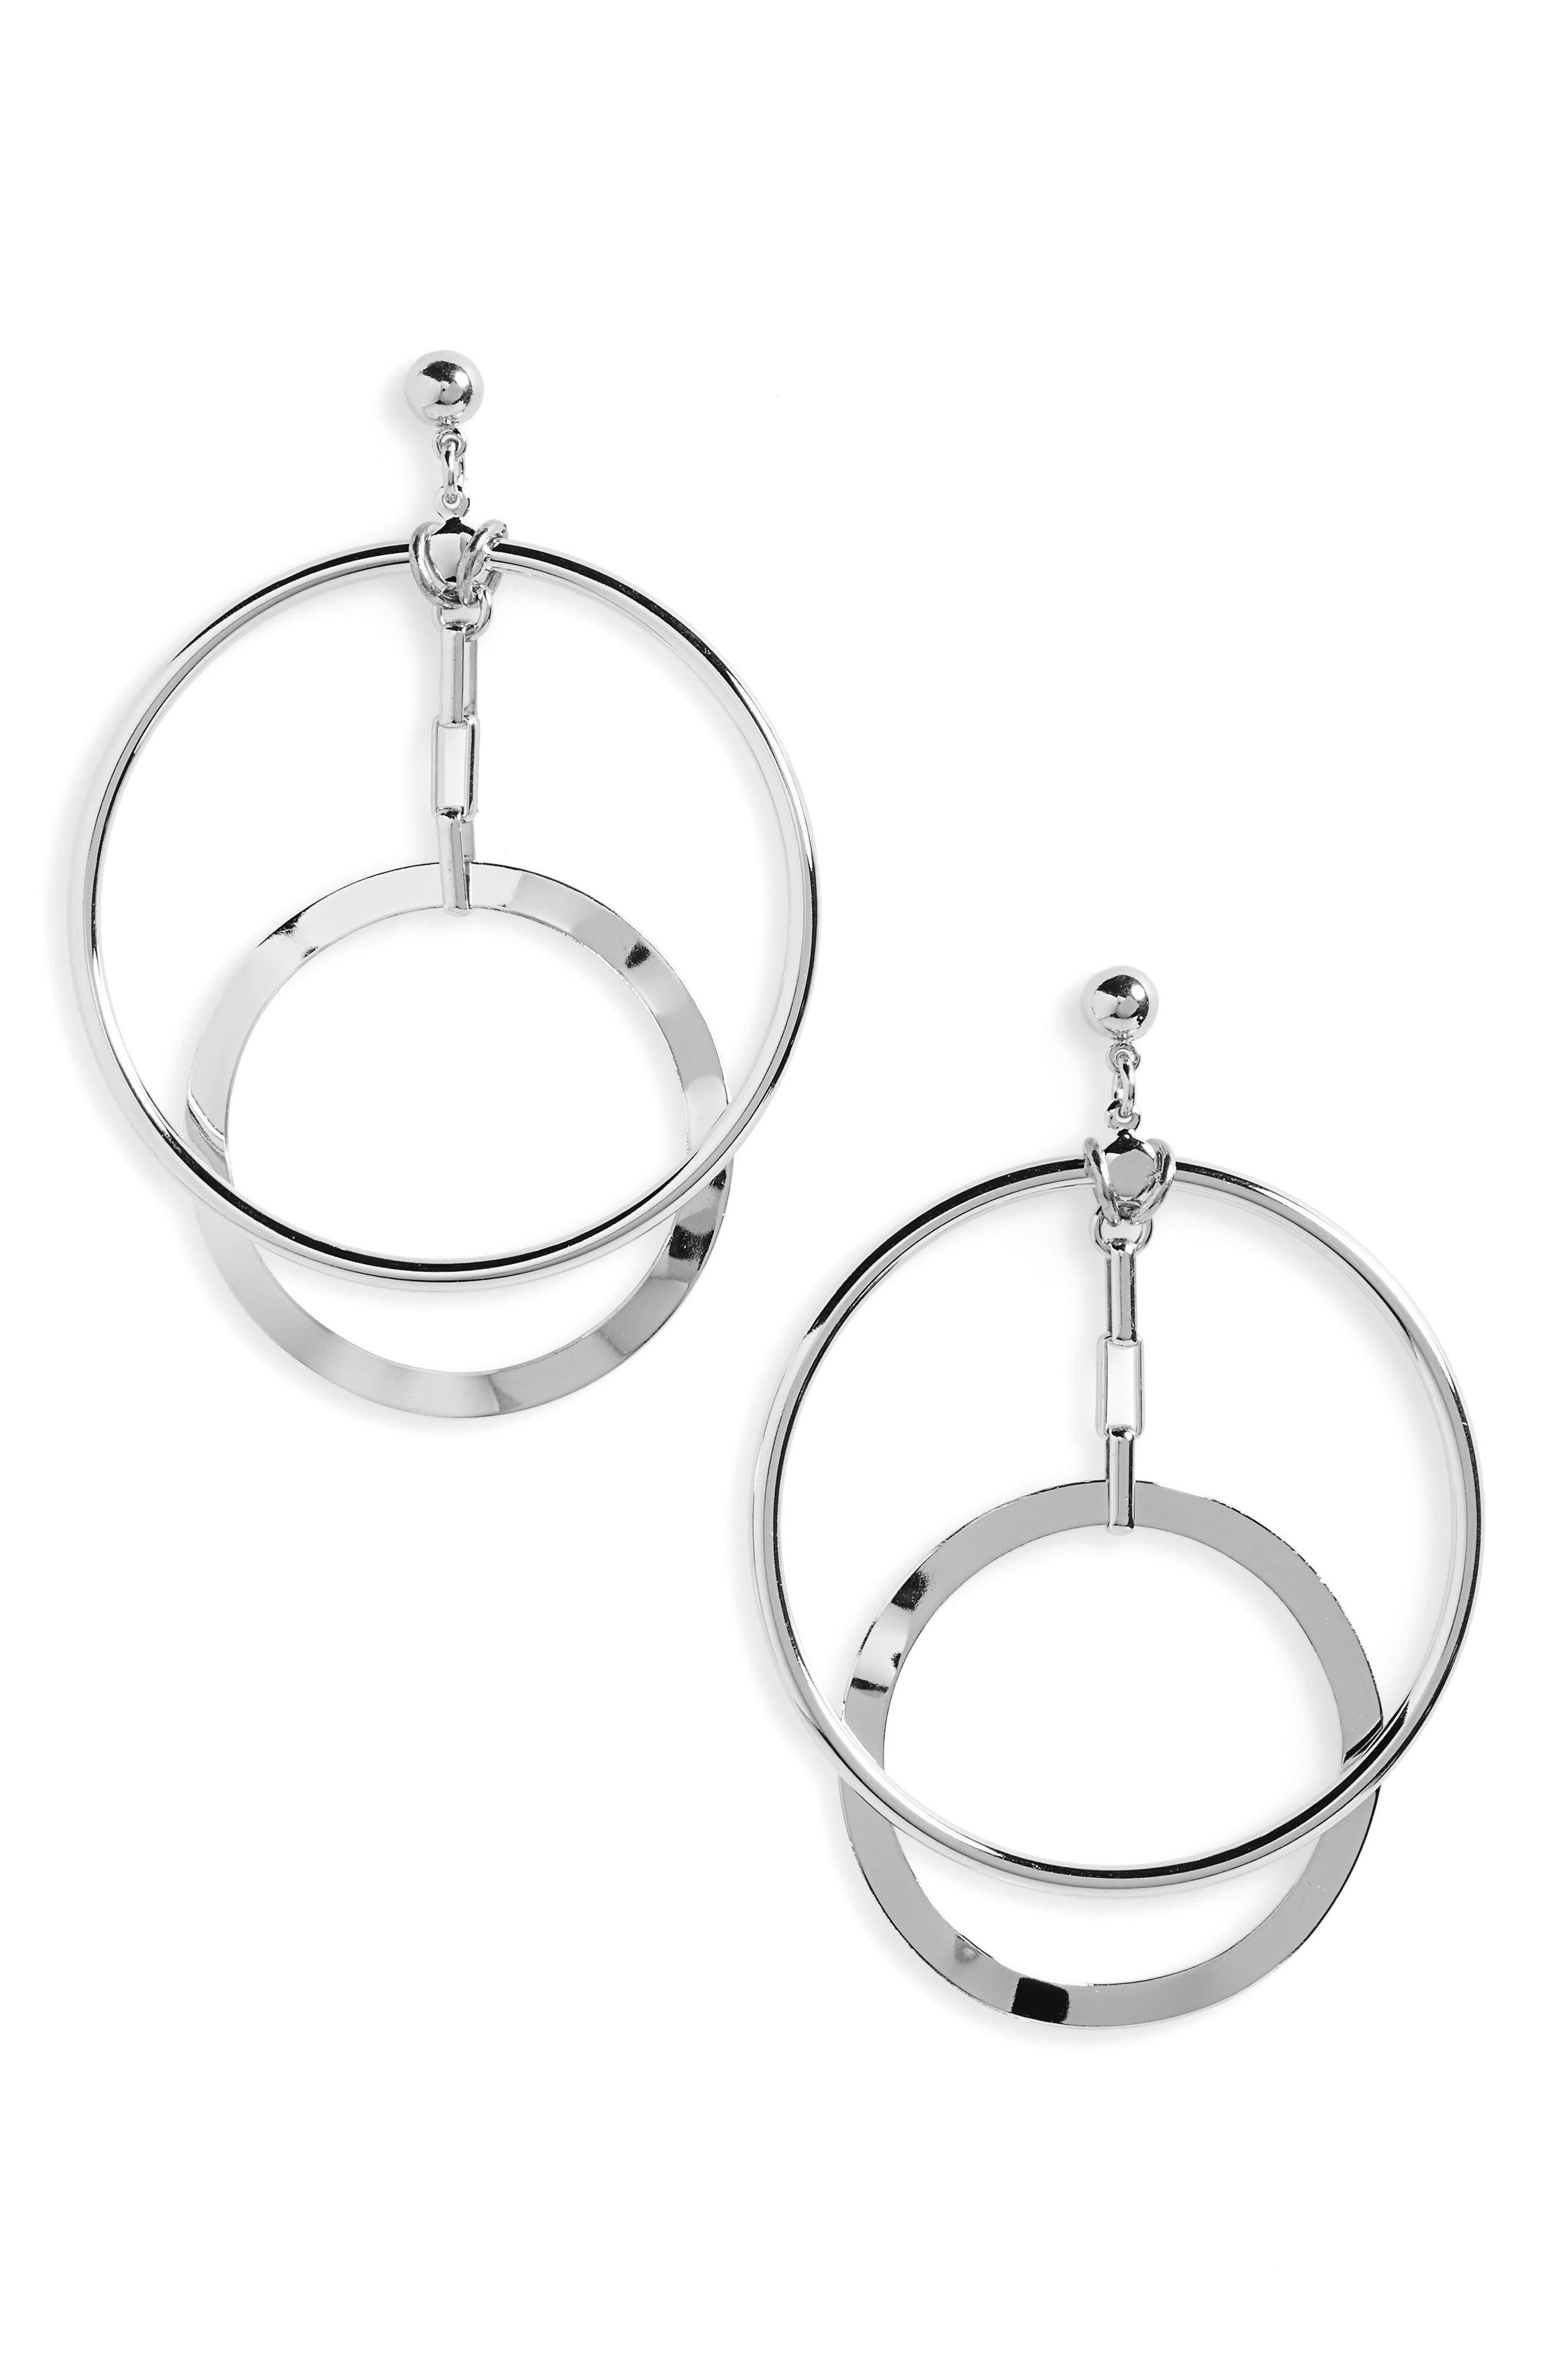 Eclipse Hoop Earrings,                         Main,                         color, Silver